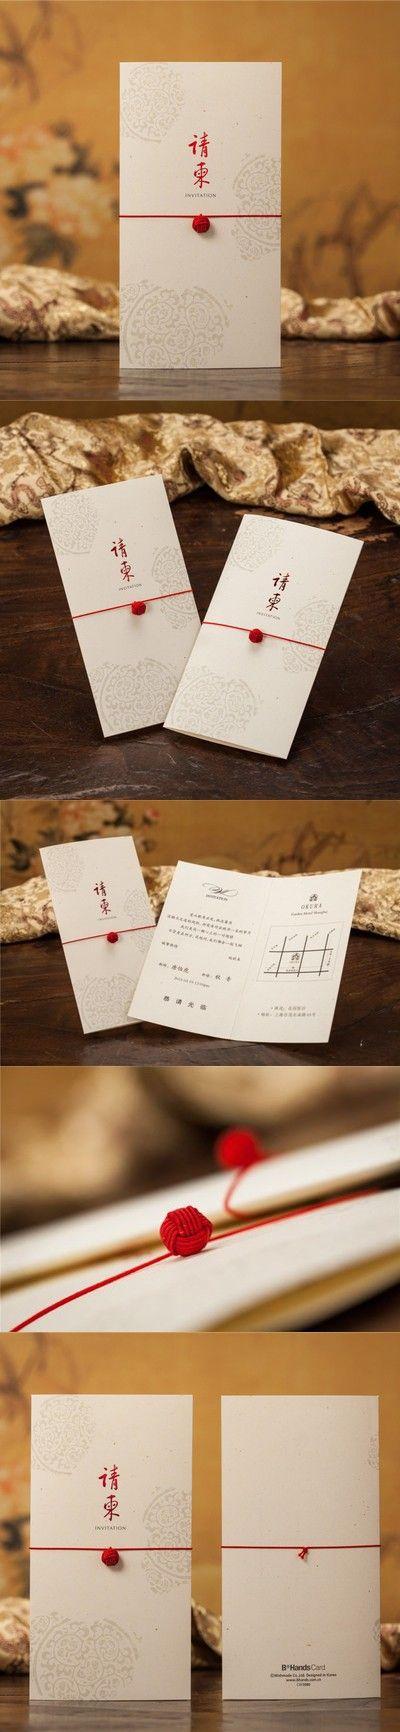 w140 Chinese wedding invitation creative personalized custom wedding or other invitations 10pcs $19.58